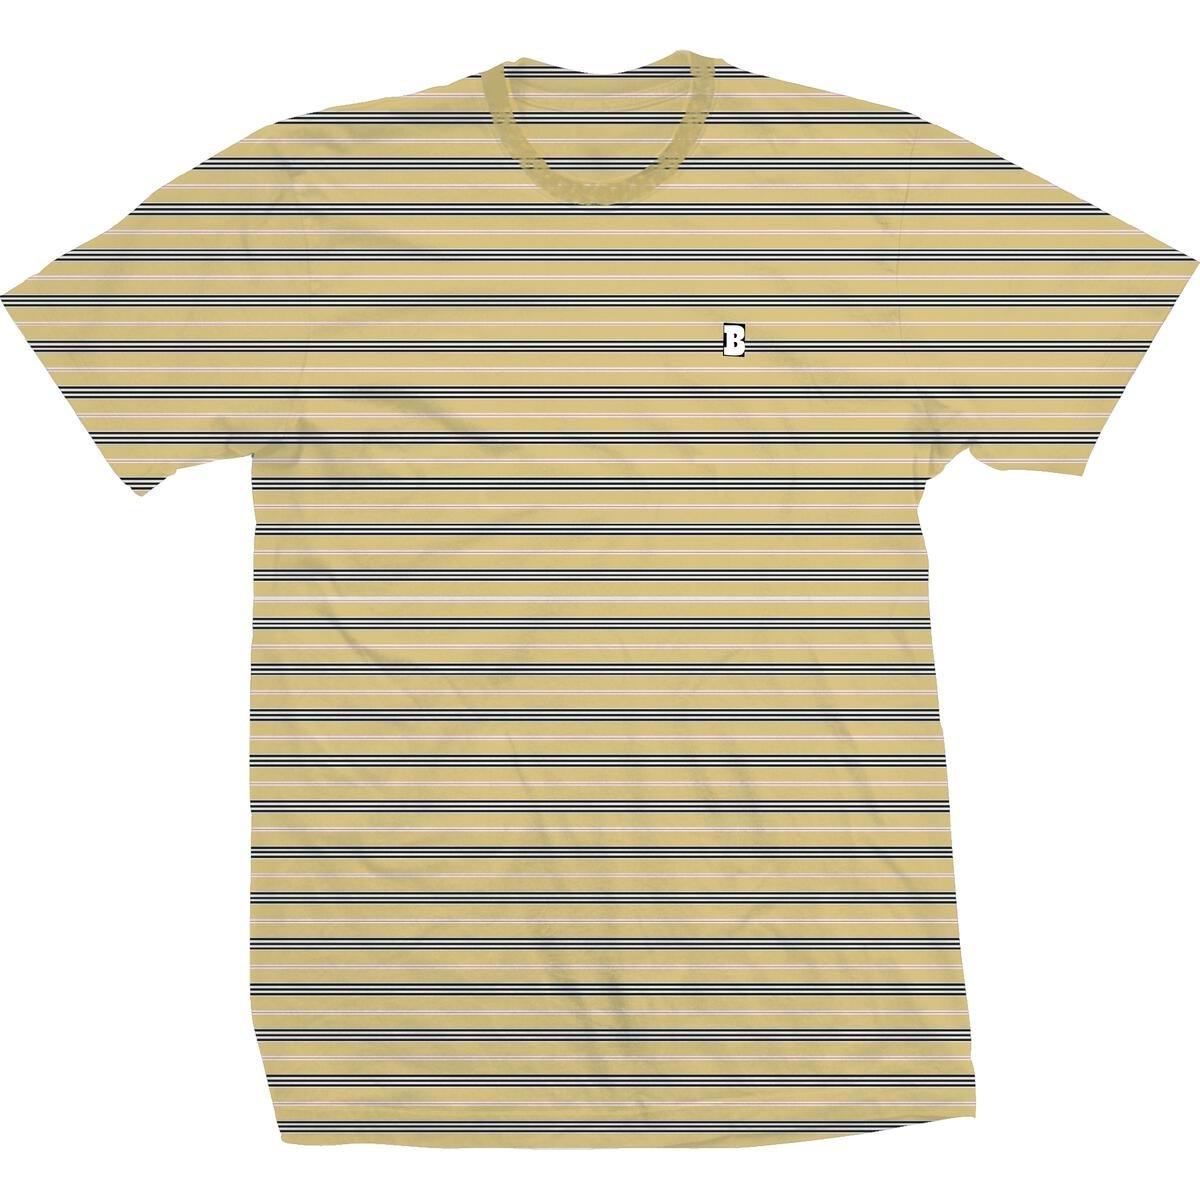 Baker Capital B Yellow Stripe s/s t shirt